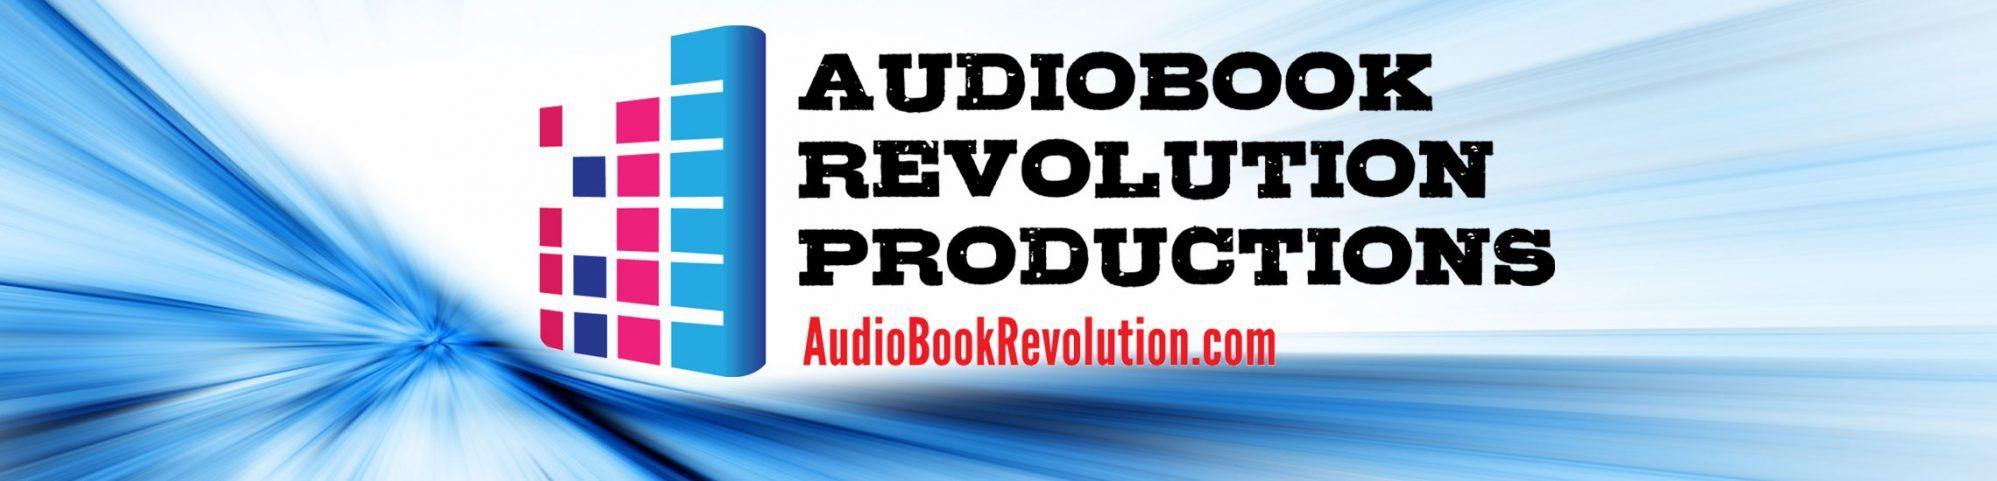 Audiobook Revolution Productions